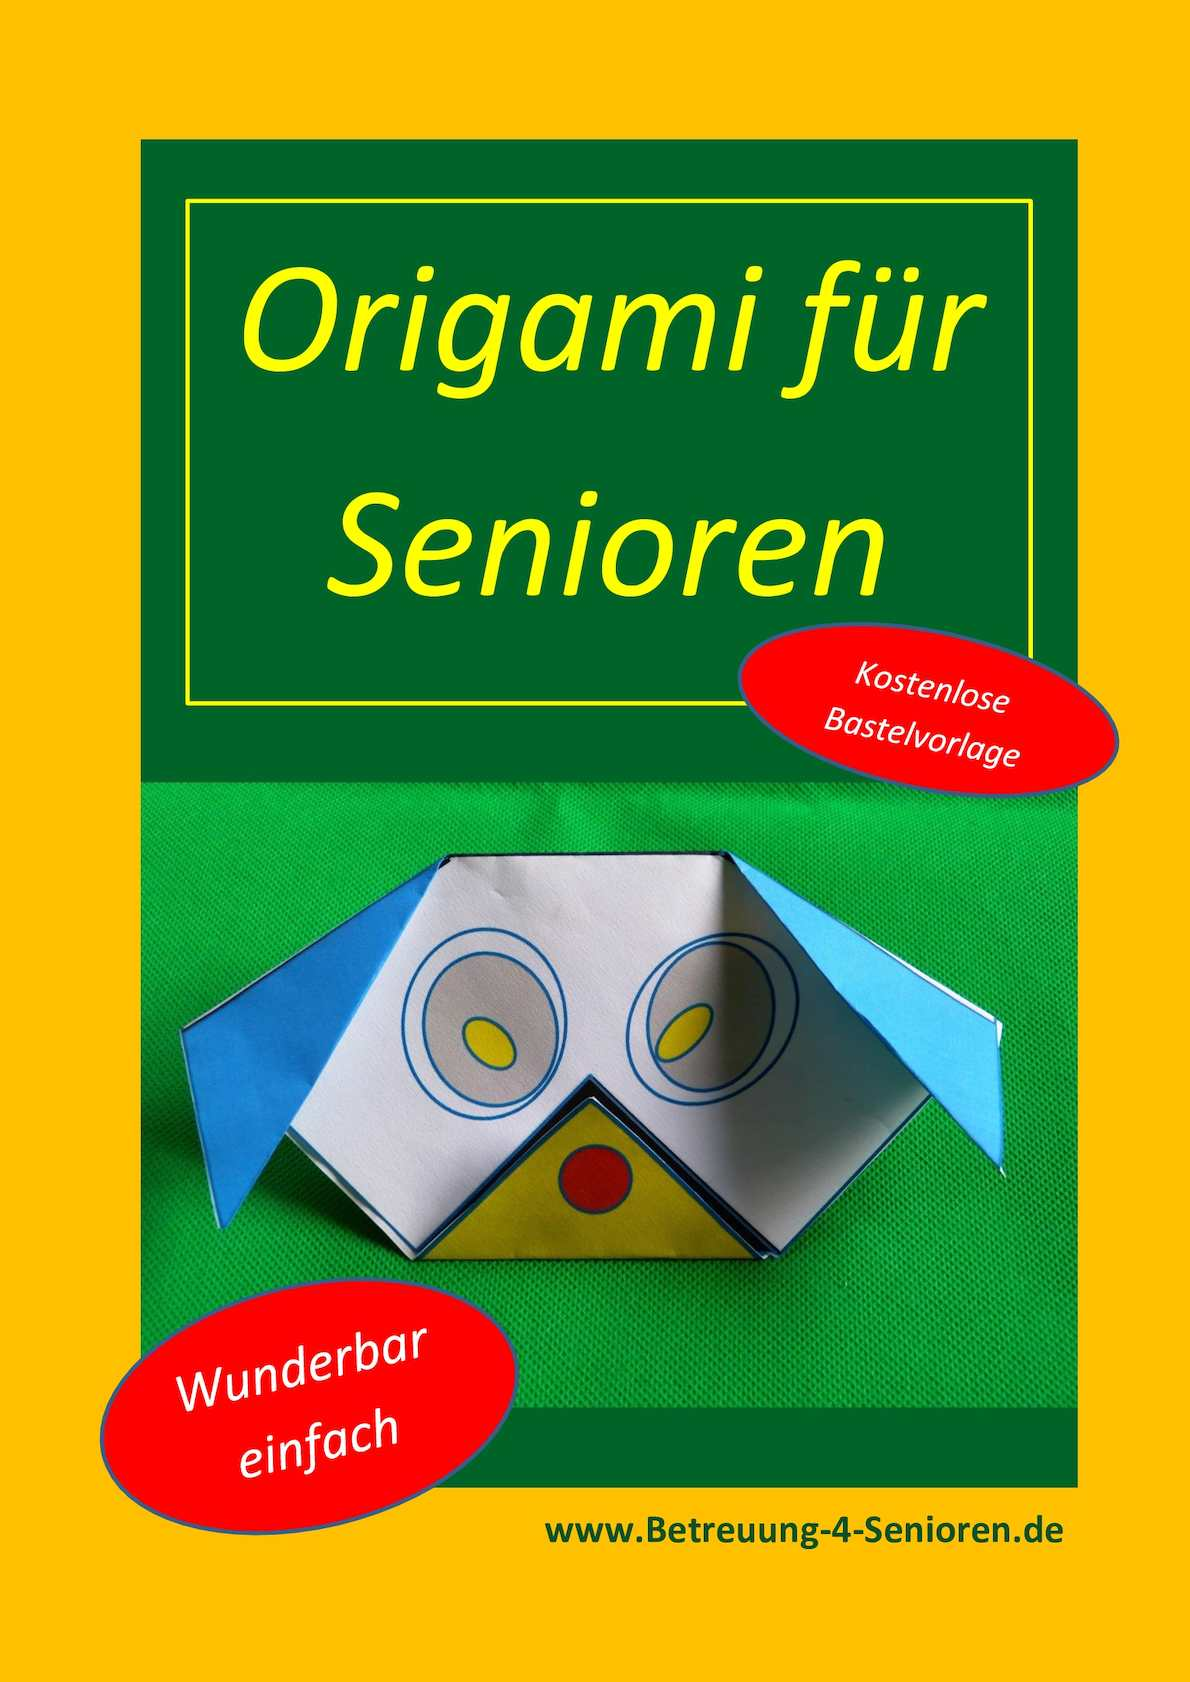 calam o origami f r senioren. Black Bedroom Furniture Sets. Home Design Ideas